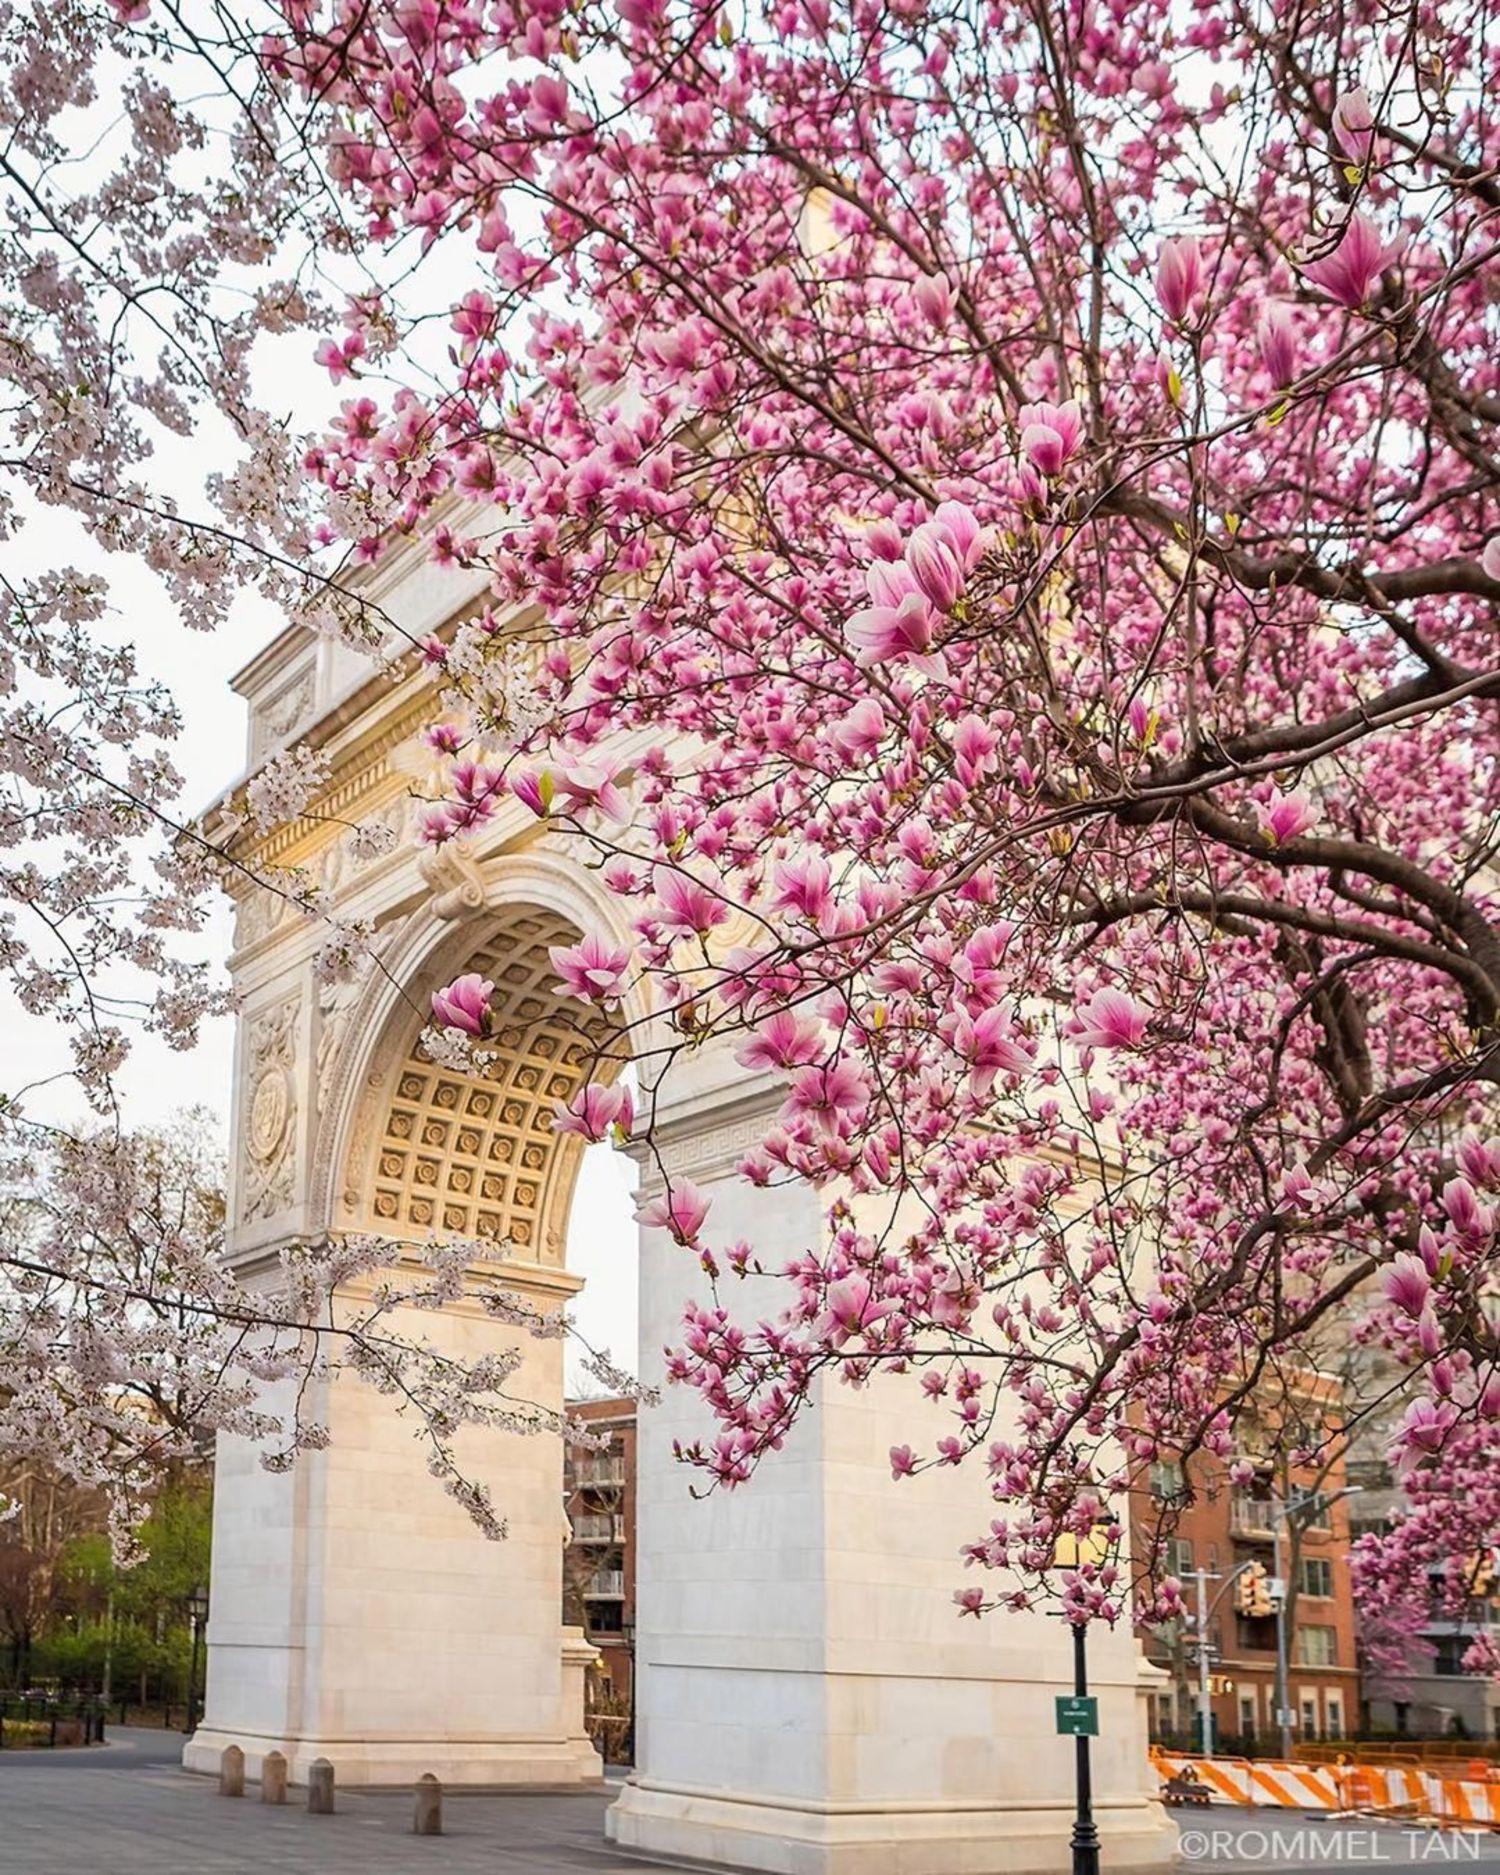 Washington Square Arch, Manhattan. Photo via @rtanphoto #viewingnyc #nyc #newyork #newyorkcity #washingtonsquarepark